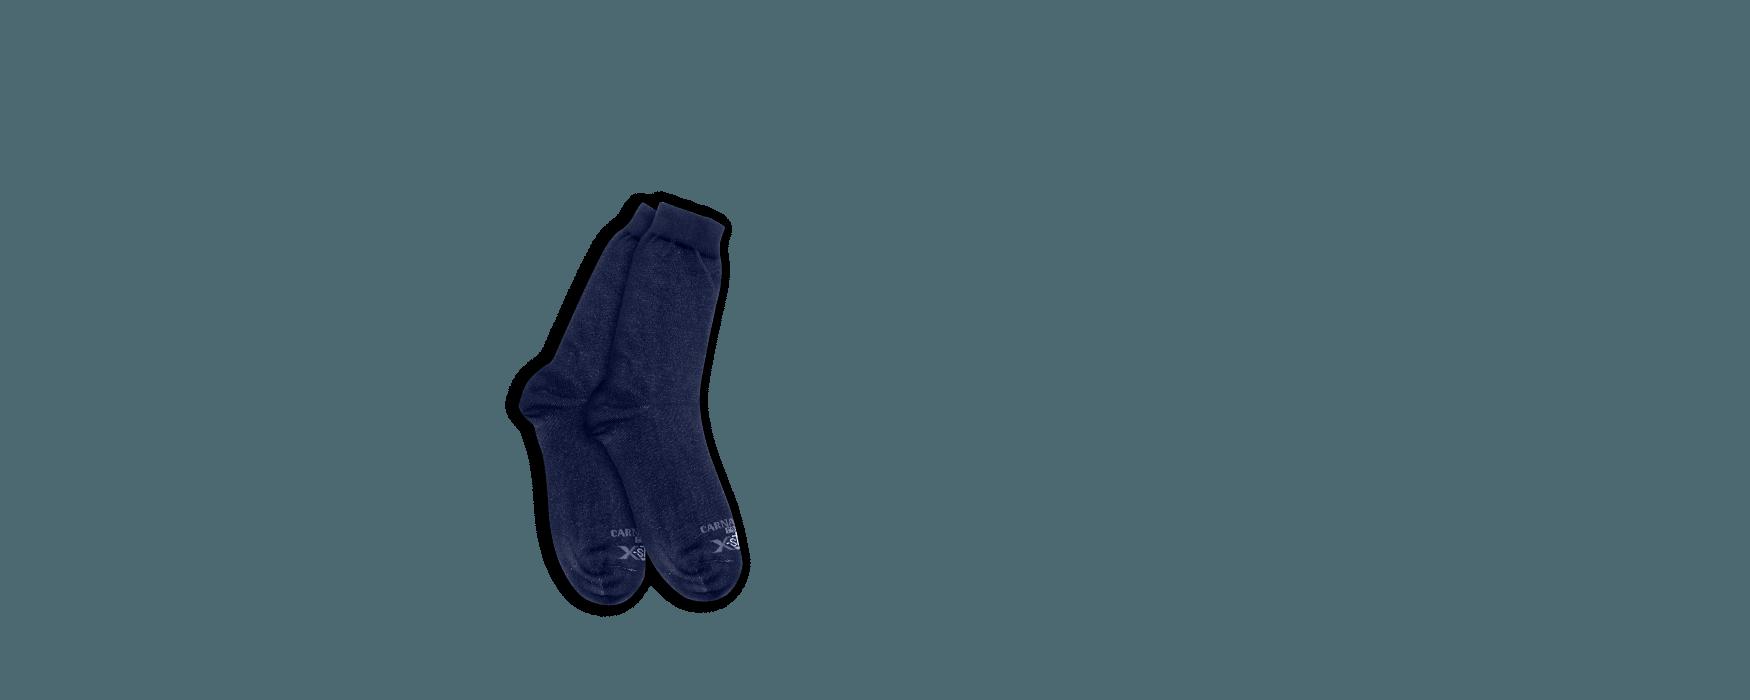 Blue Sock 1